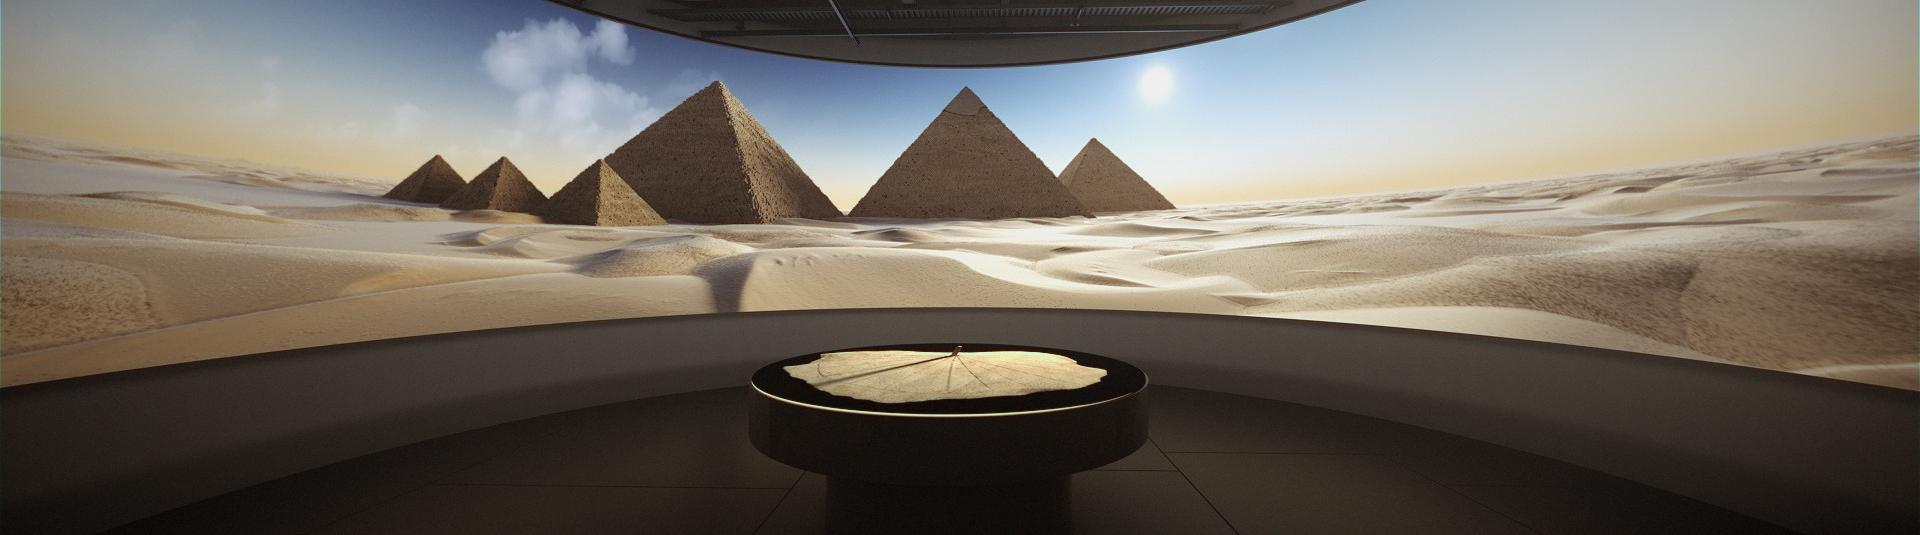 360 degrees screen